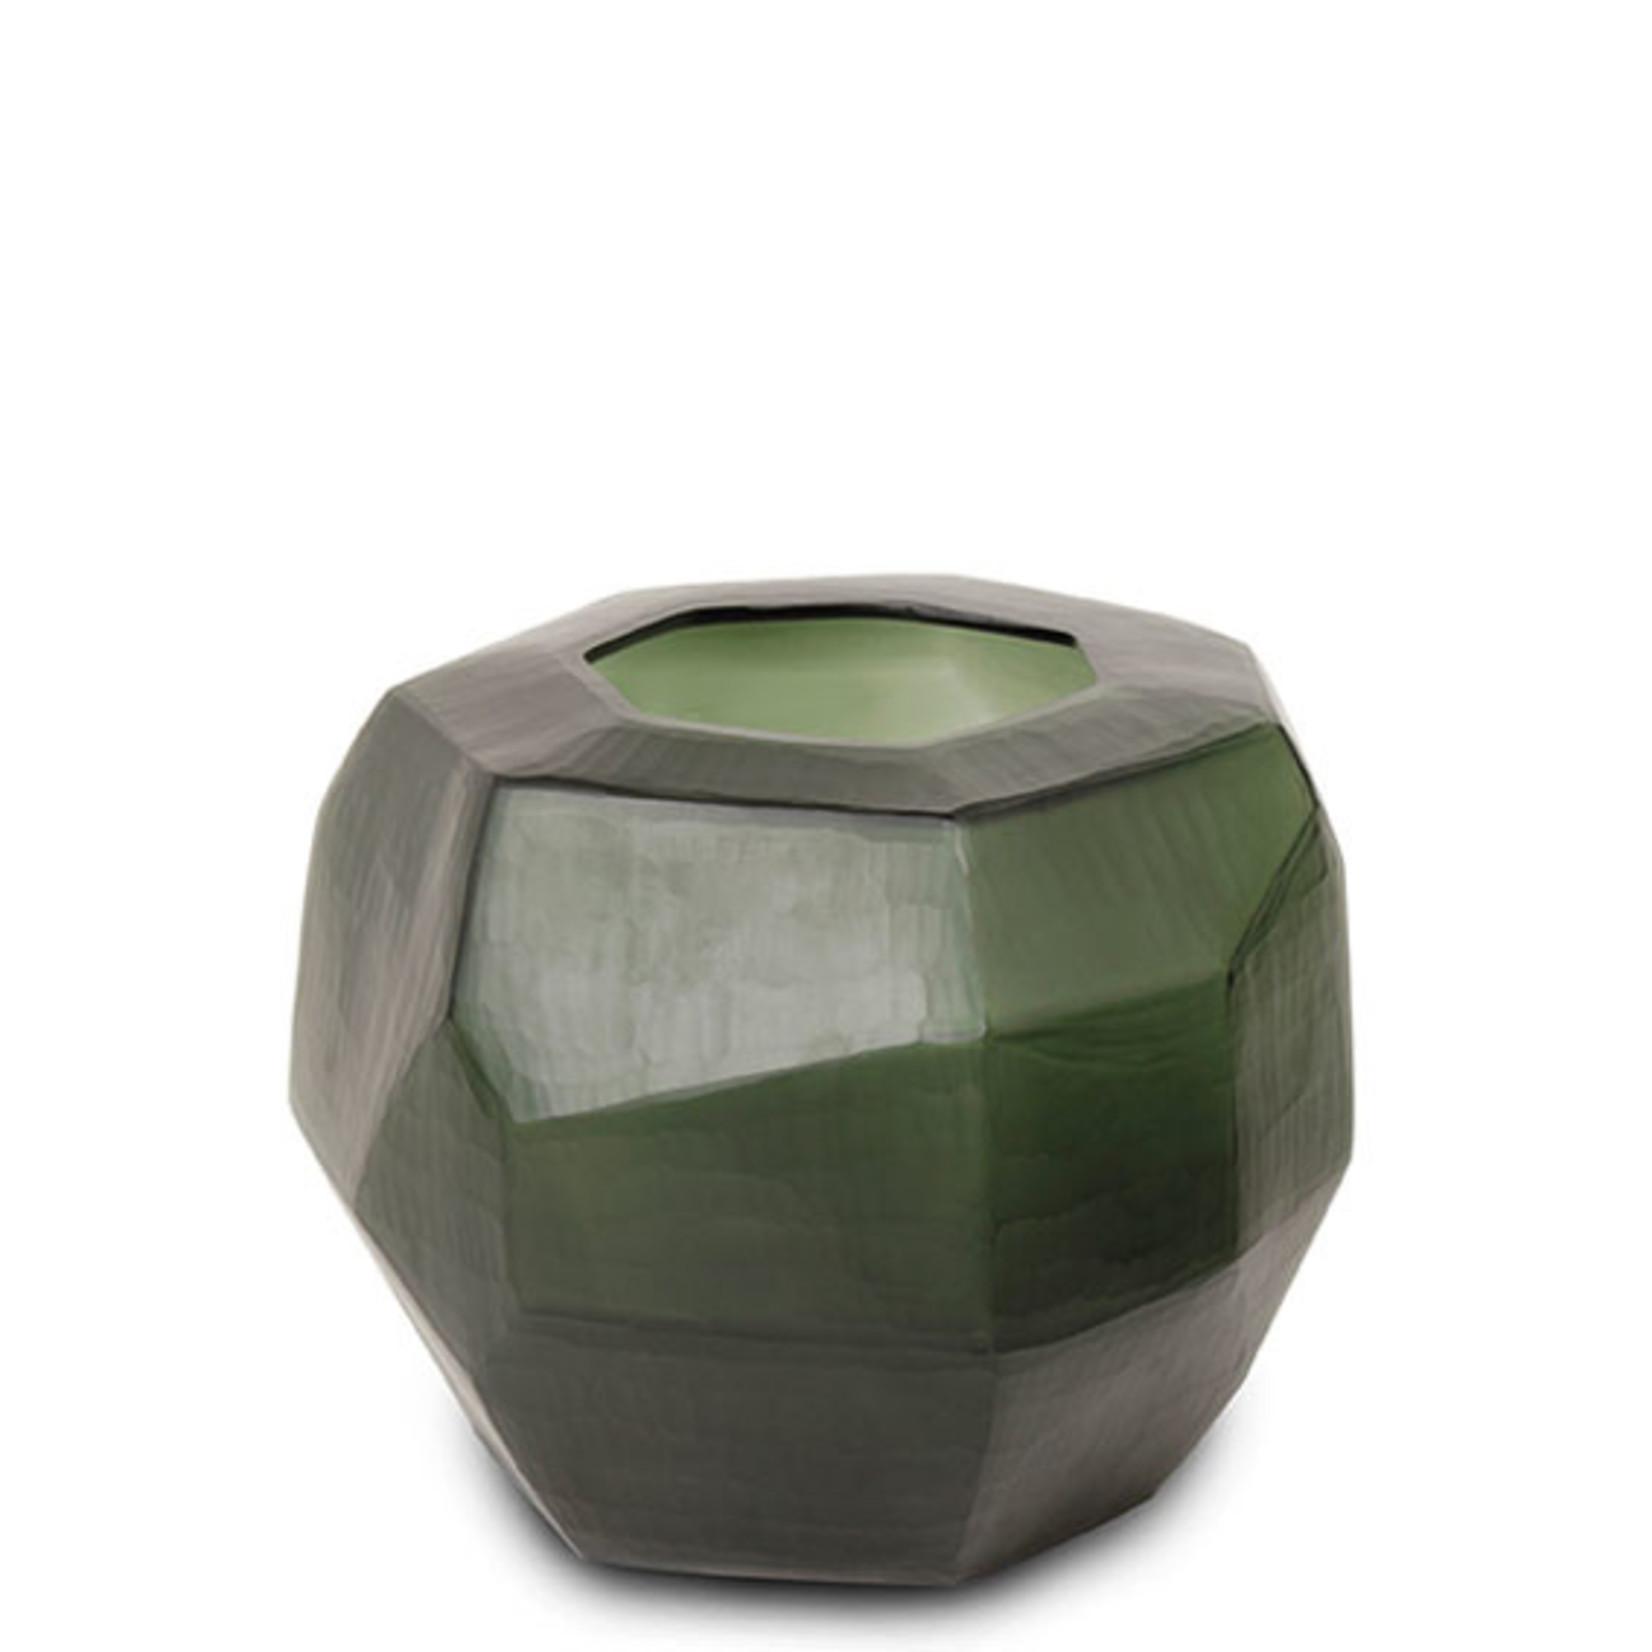 Guaxs Vase Cubistic Round | Black / Steel Gray